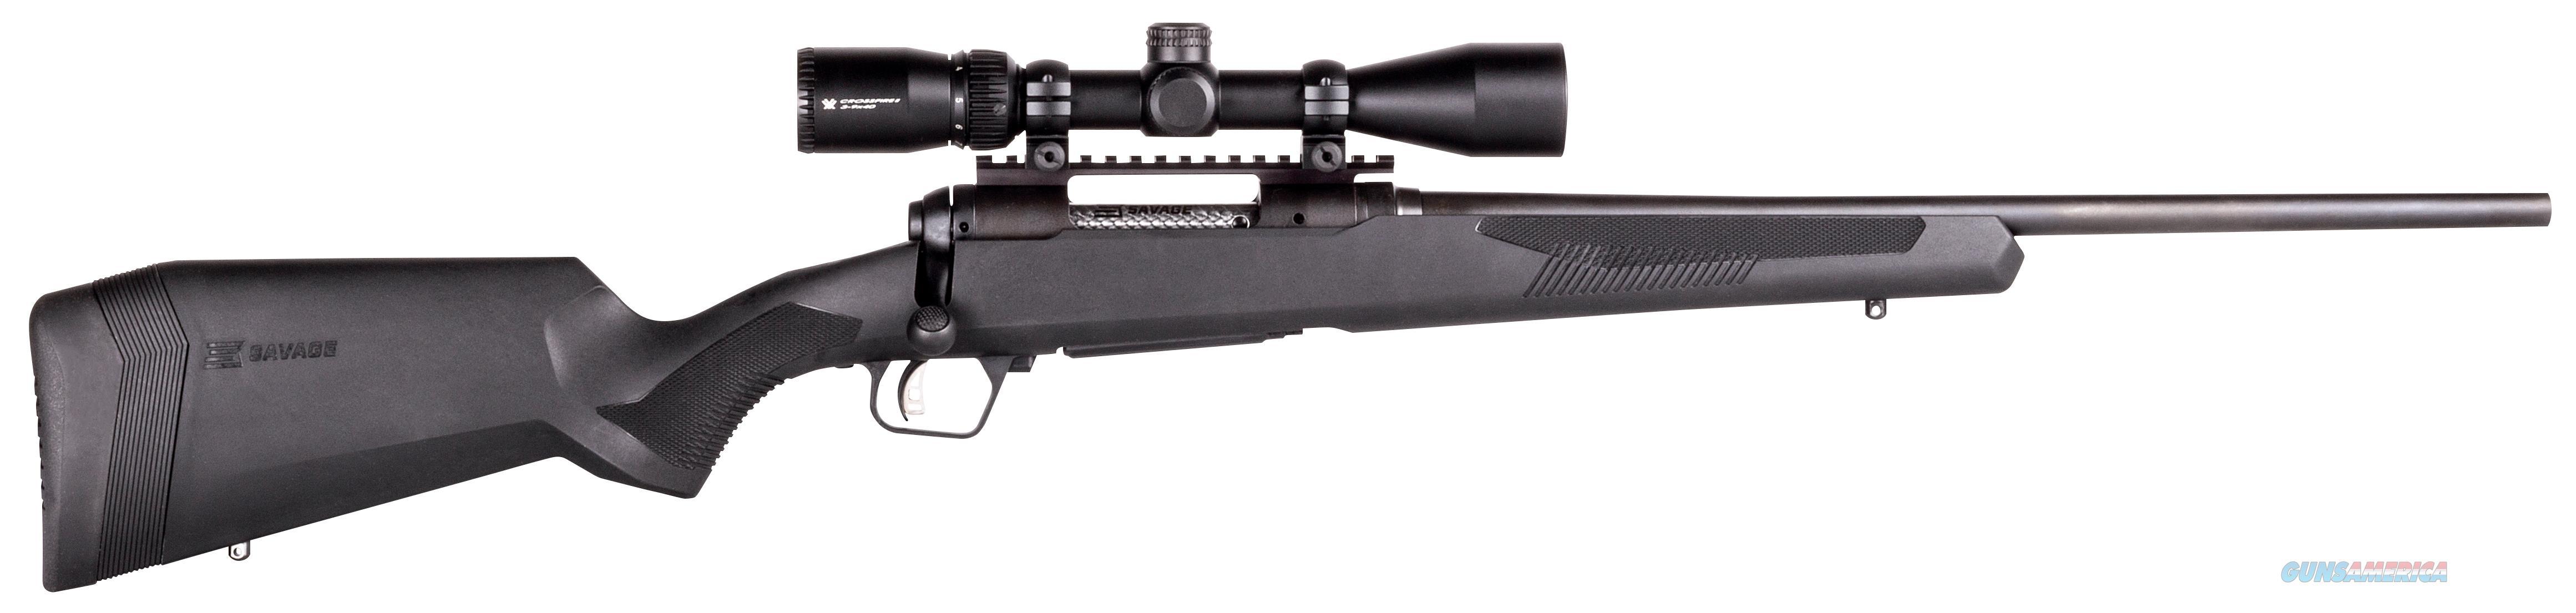 "110 Apex Hunt Xp 7Mm-08 20""Pkg 57305  Guns > Rifles > S Misc Rifles"